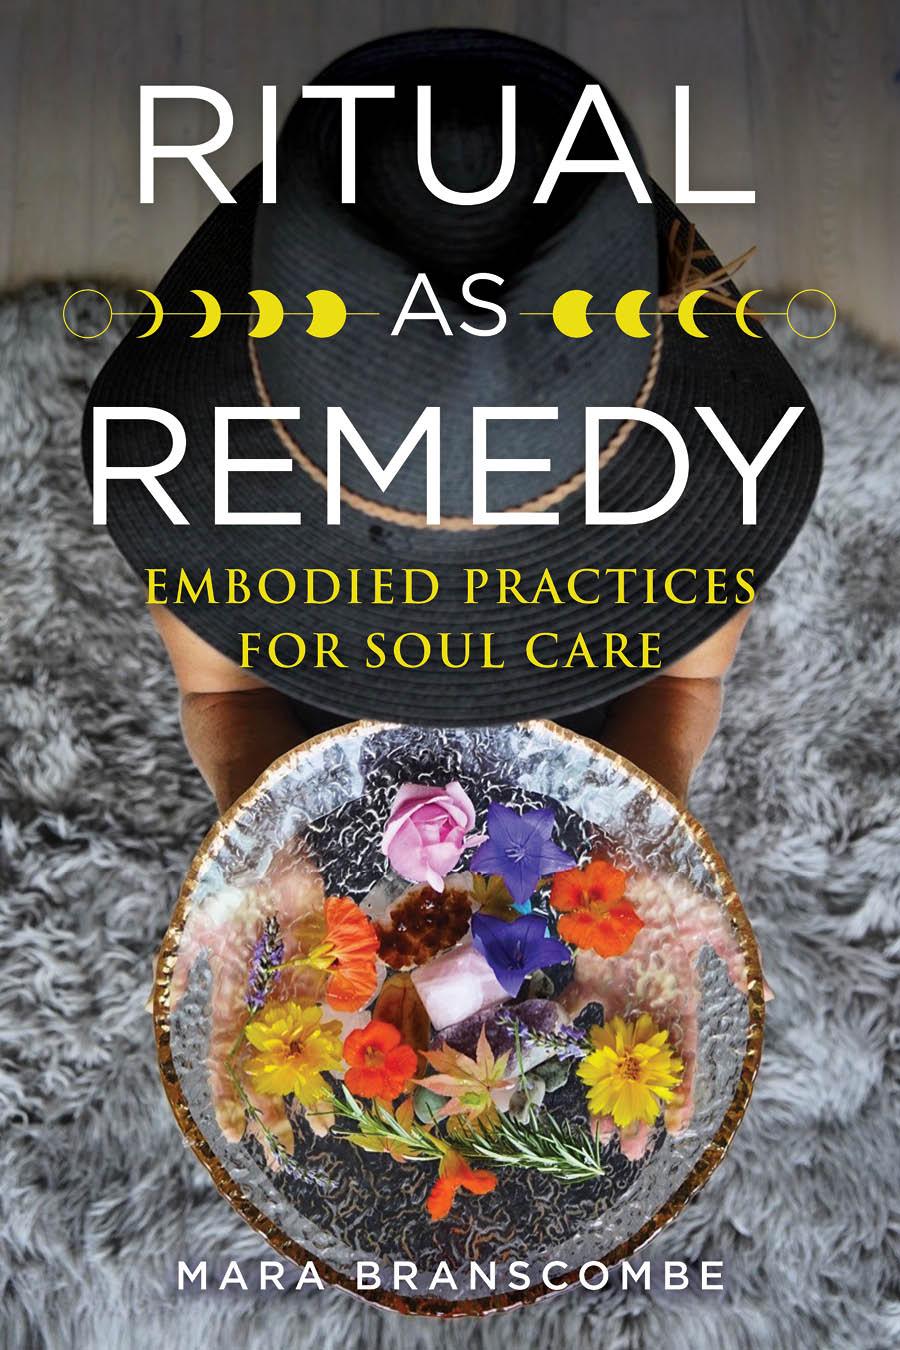 Ritual as Remedy by Mara Branscombe